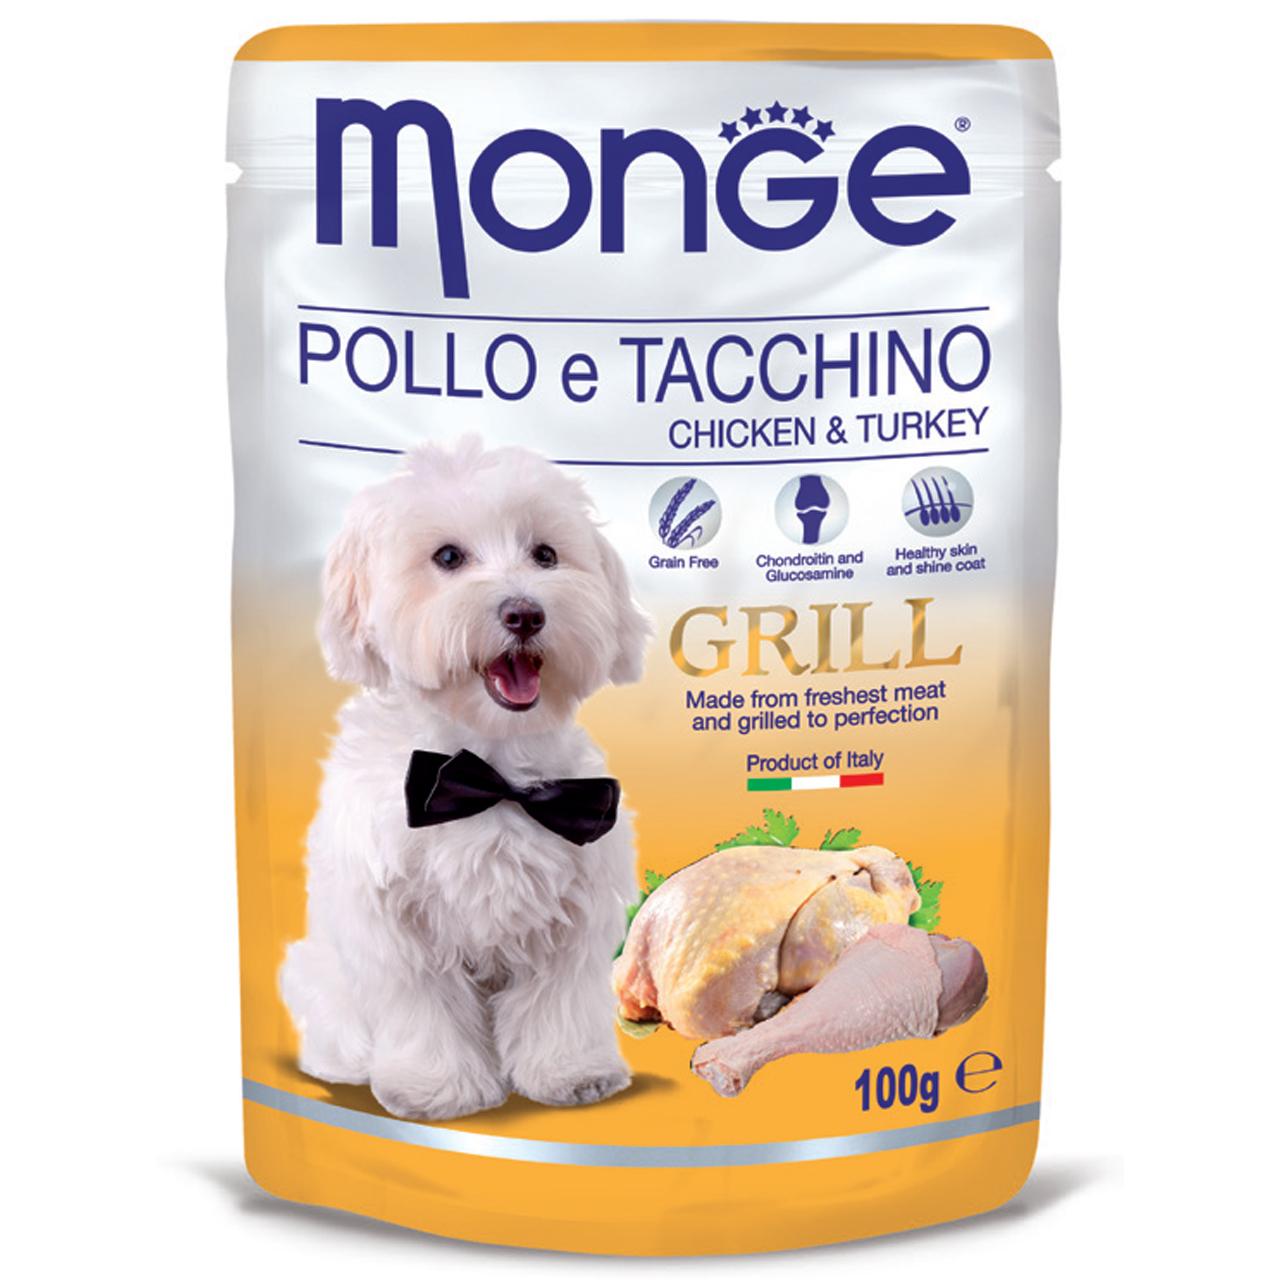 پوچ سگ مونگه مدل Pouch Chicken & Turkey-13116 با طعم مرغ و بوقلمون وزن 100 گرم